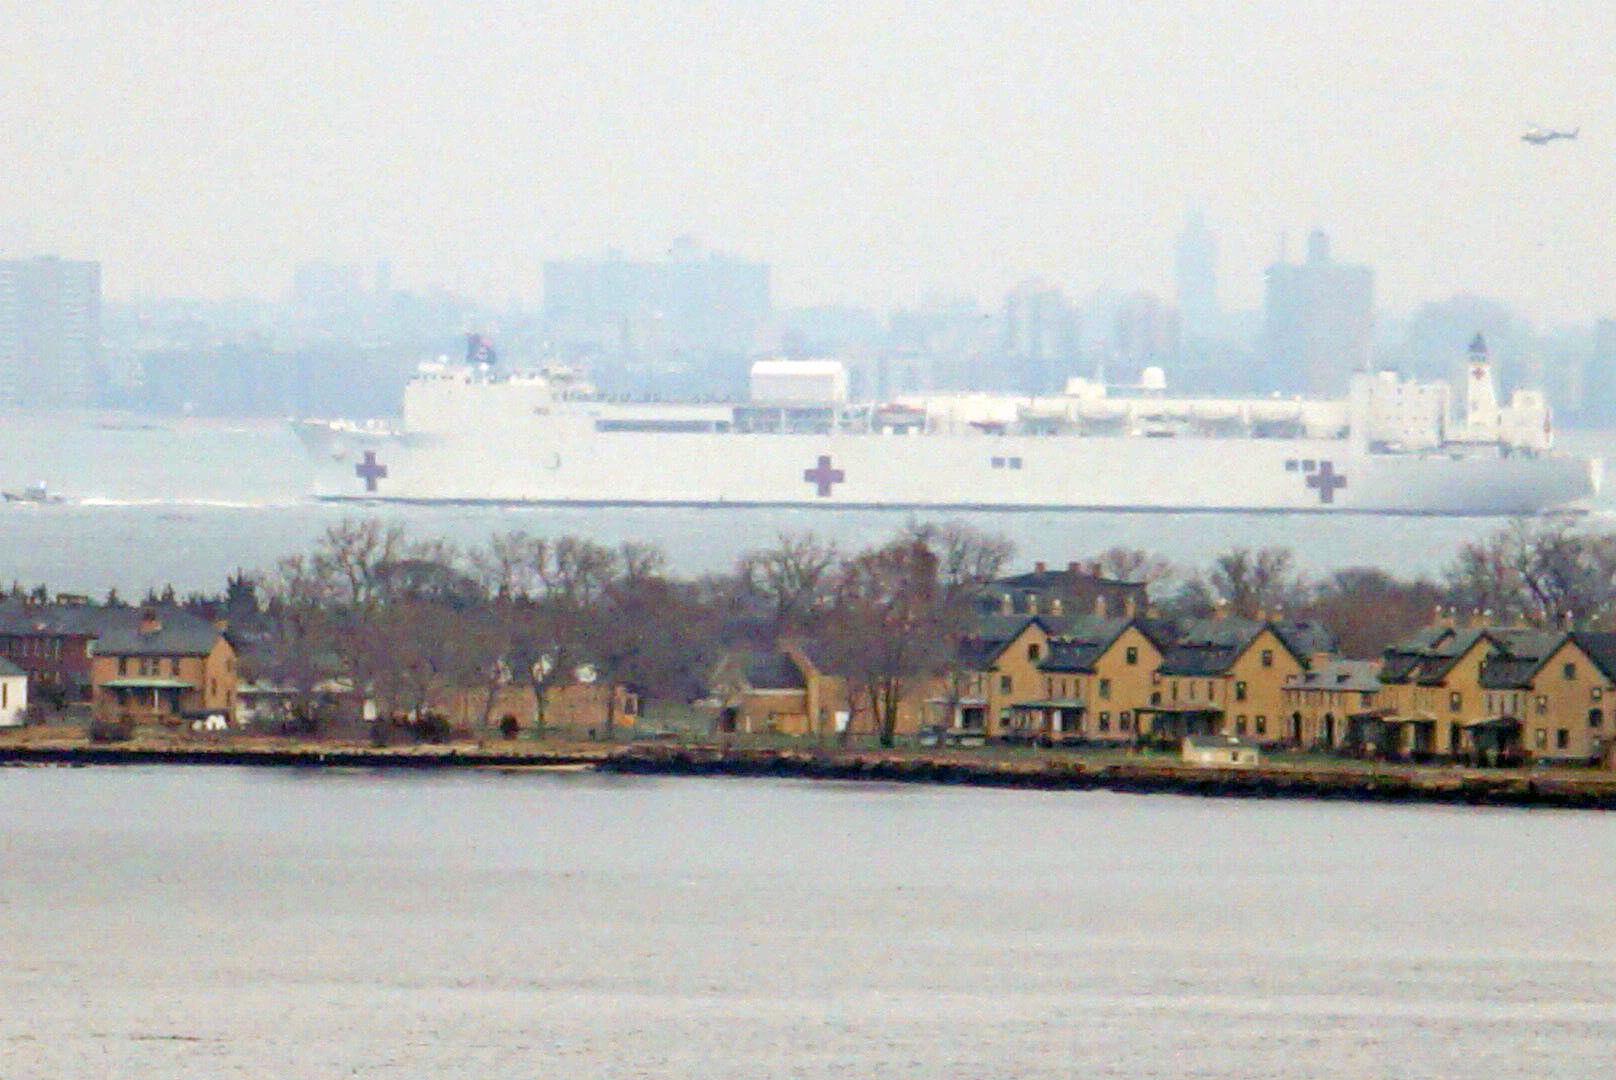 Photo of USNS Comfort sailing into New York harbor